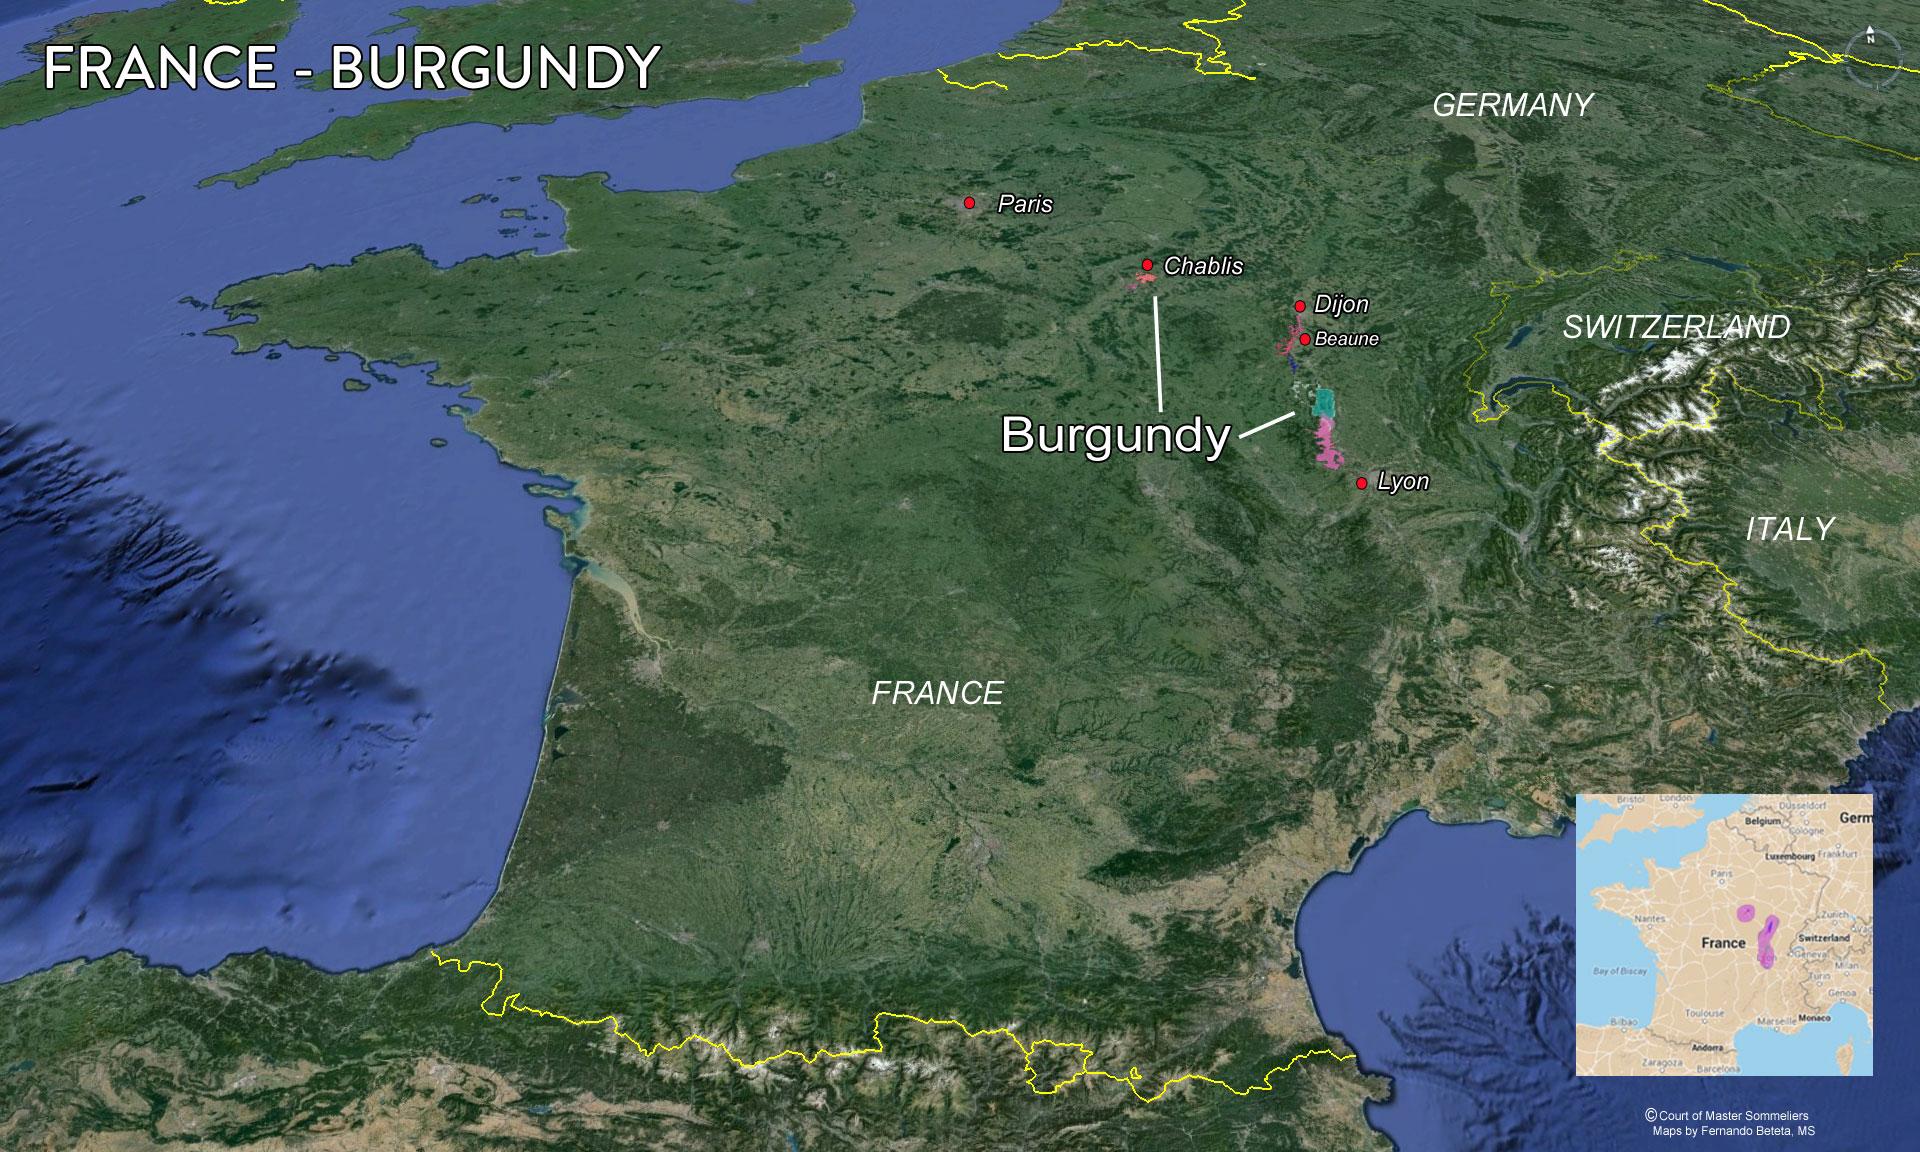 France-Burgundy-Overview.jpg